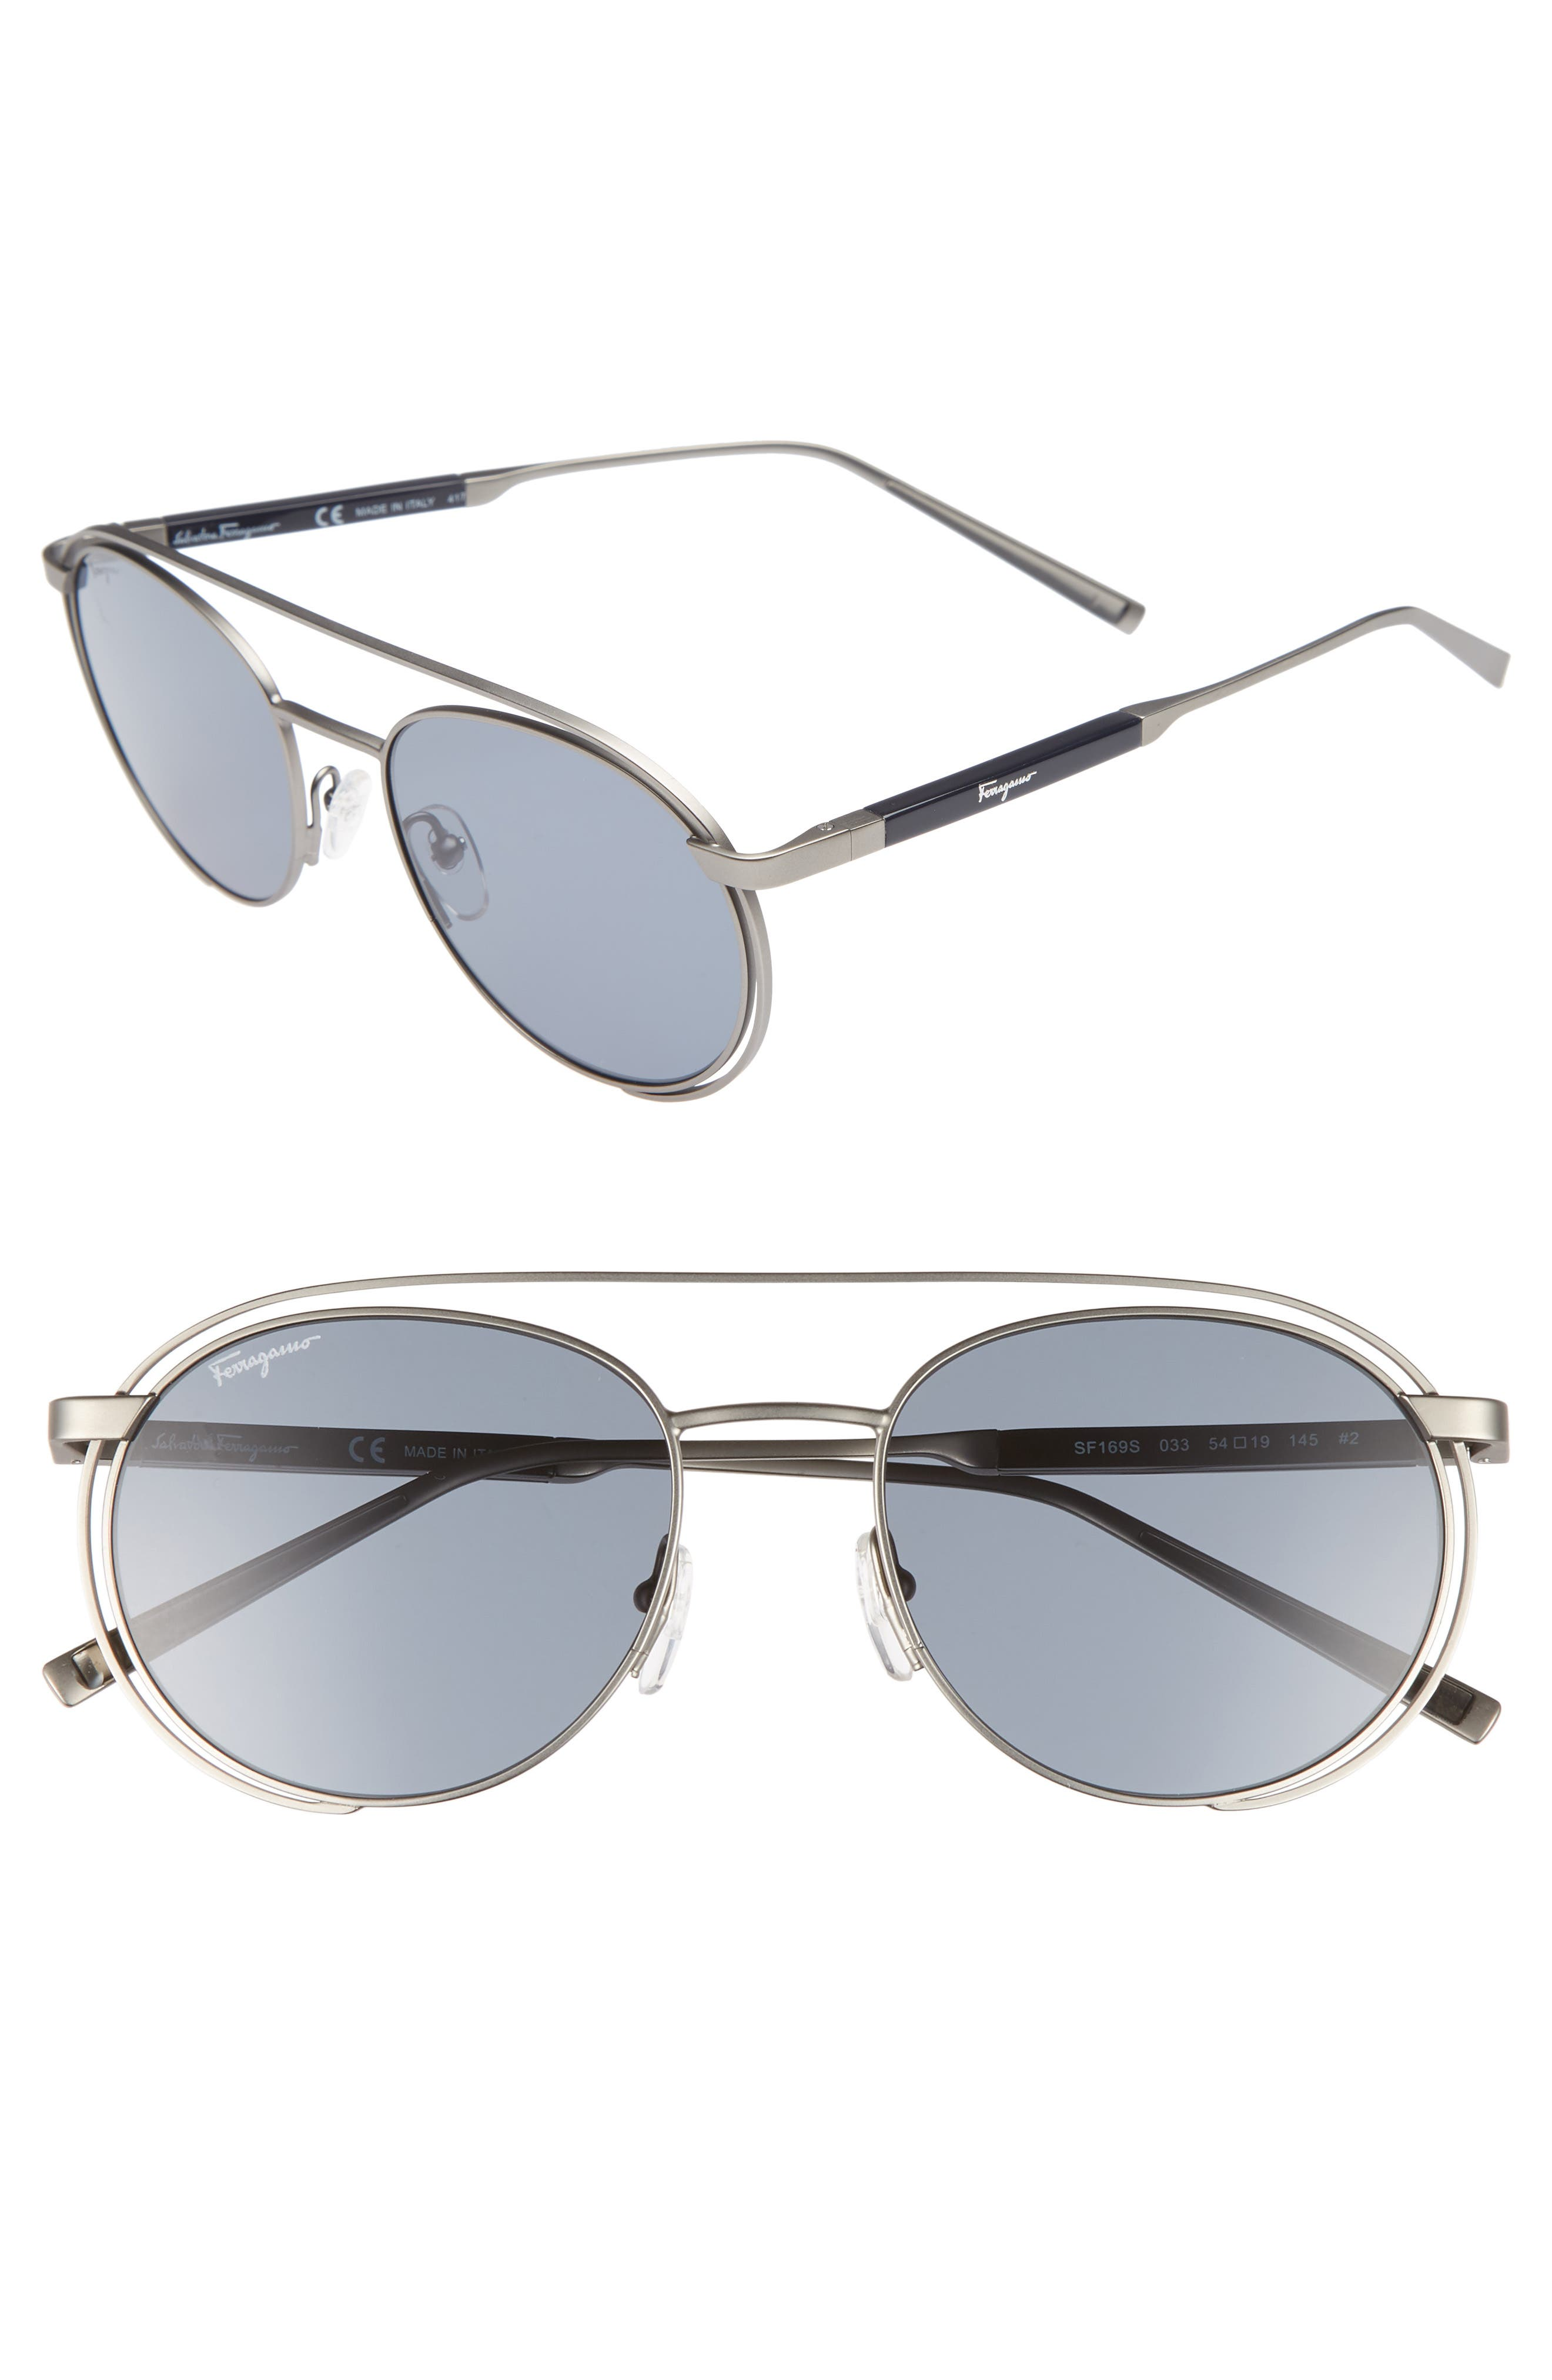 54mm Round Sunglasses,                         Main,                         color, Matte Gunmetal